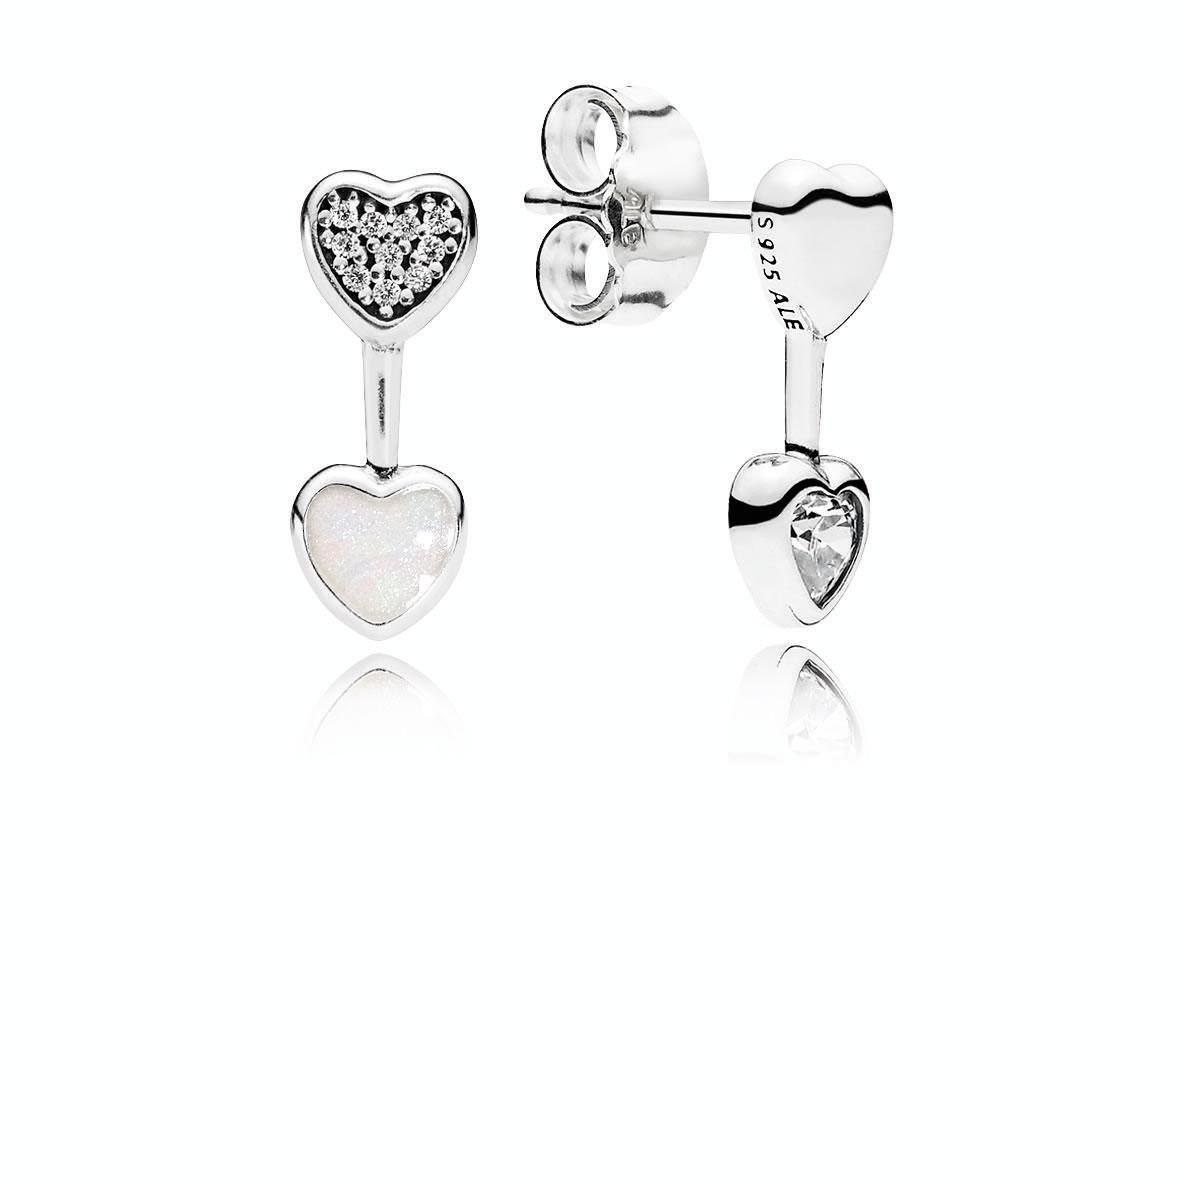 Hearts Of Love Earrings The Art Of Pandora